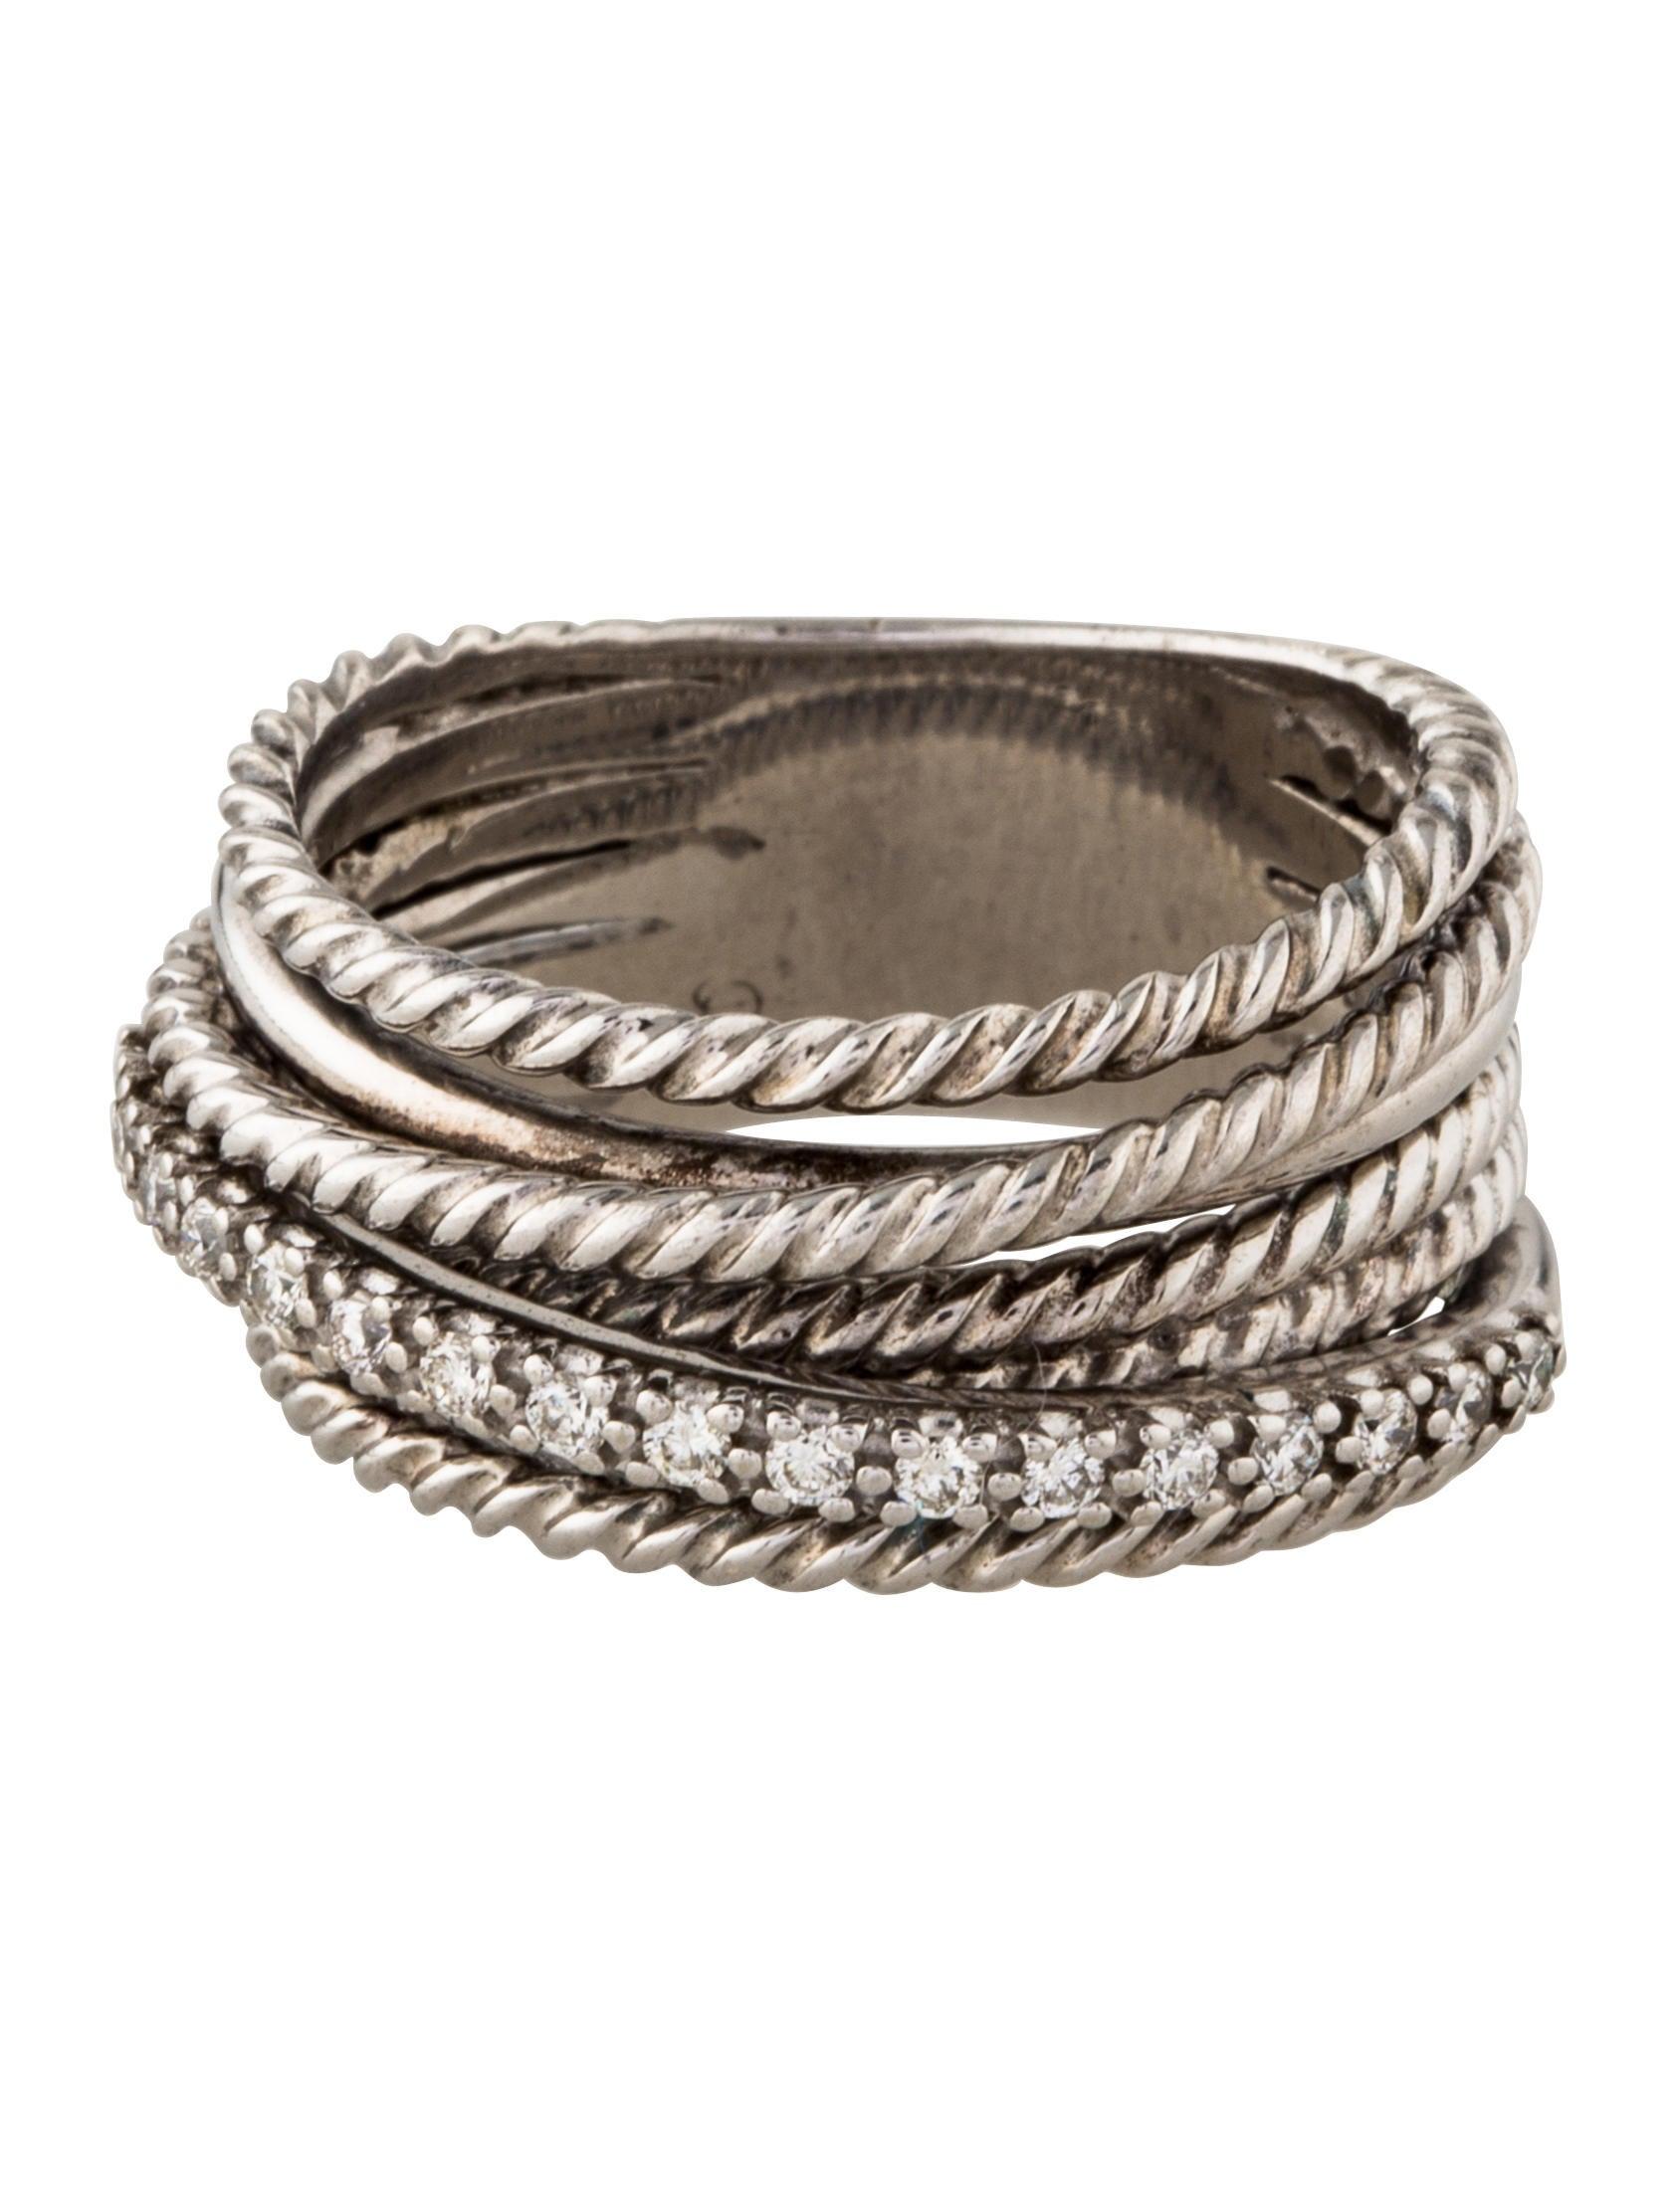 david yurman 14k diamond crossover wide ring w tags. Black Bedroom Furniture Sets. Home Design Ideas